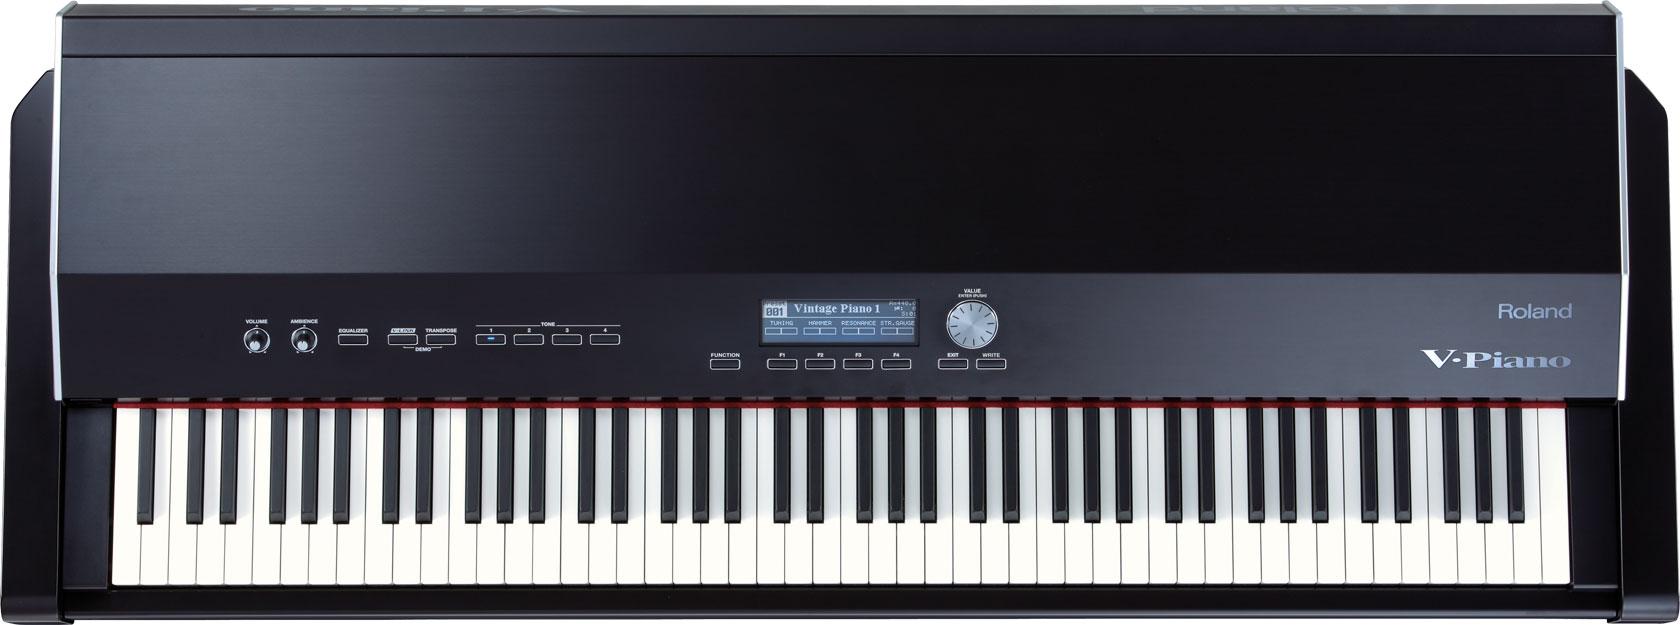 v_piano_top_gal